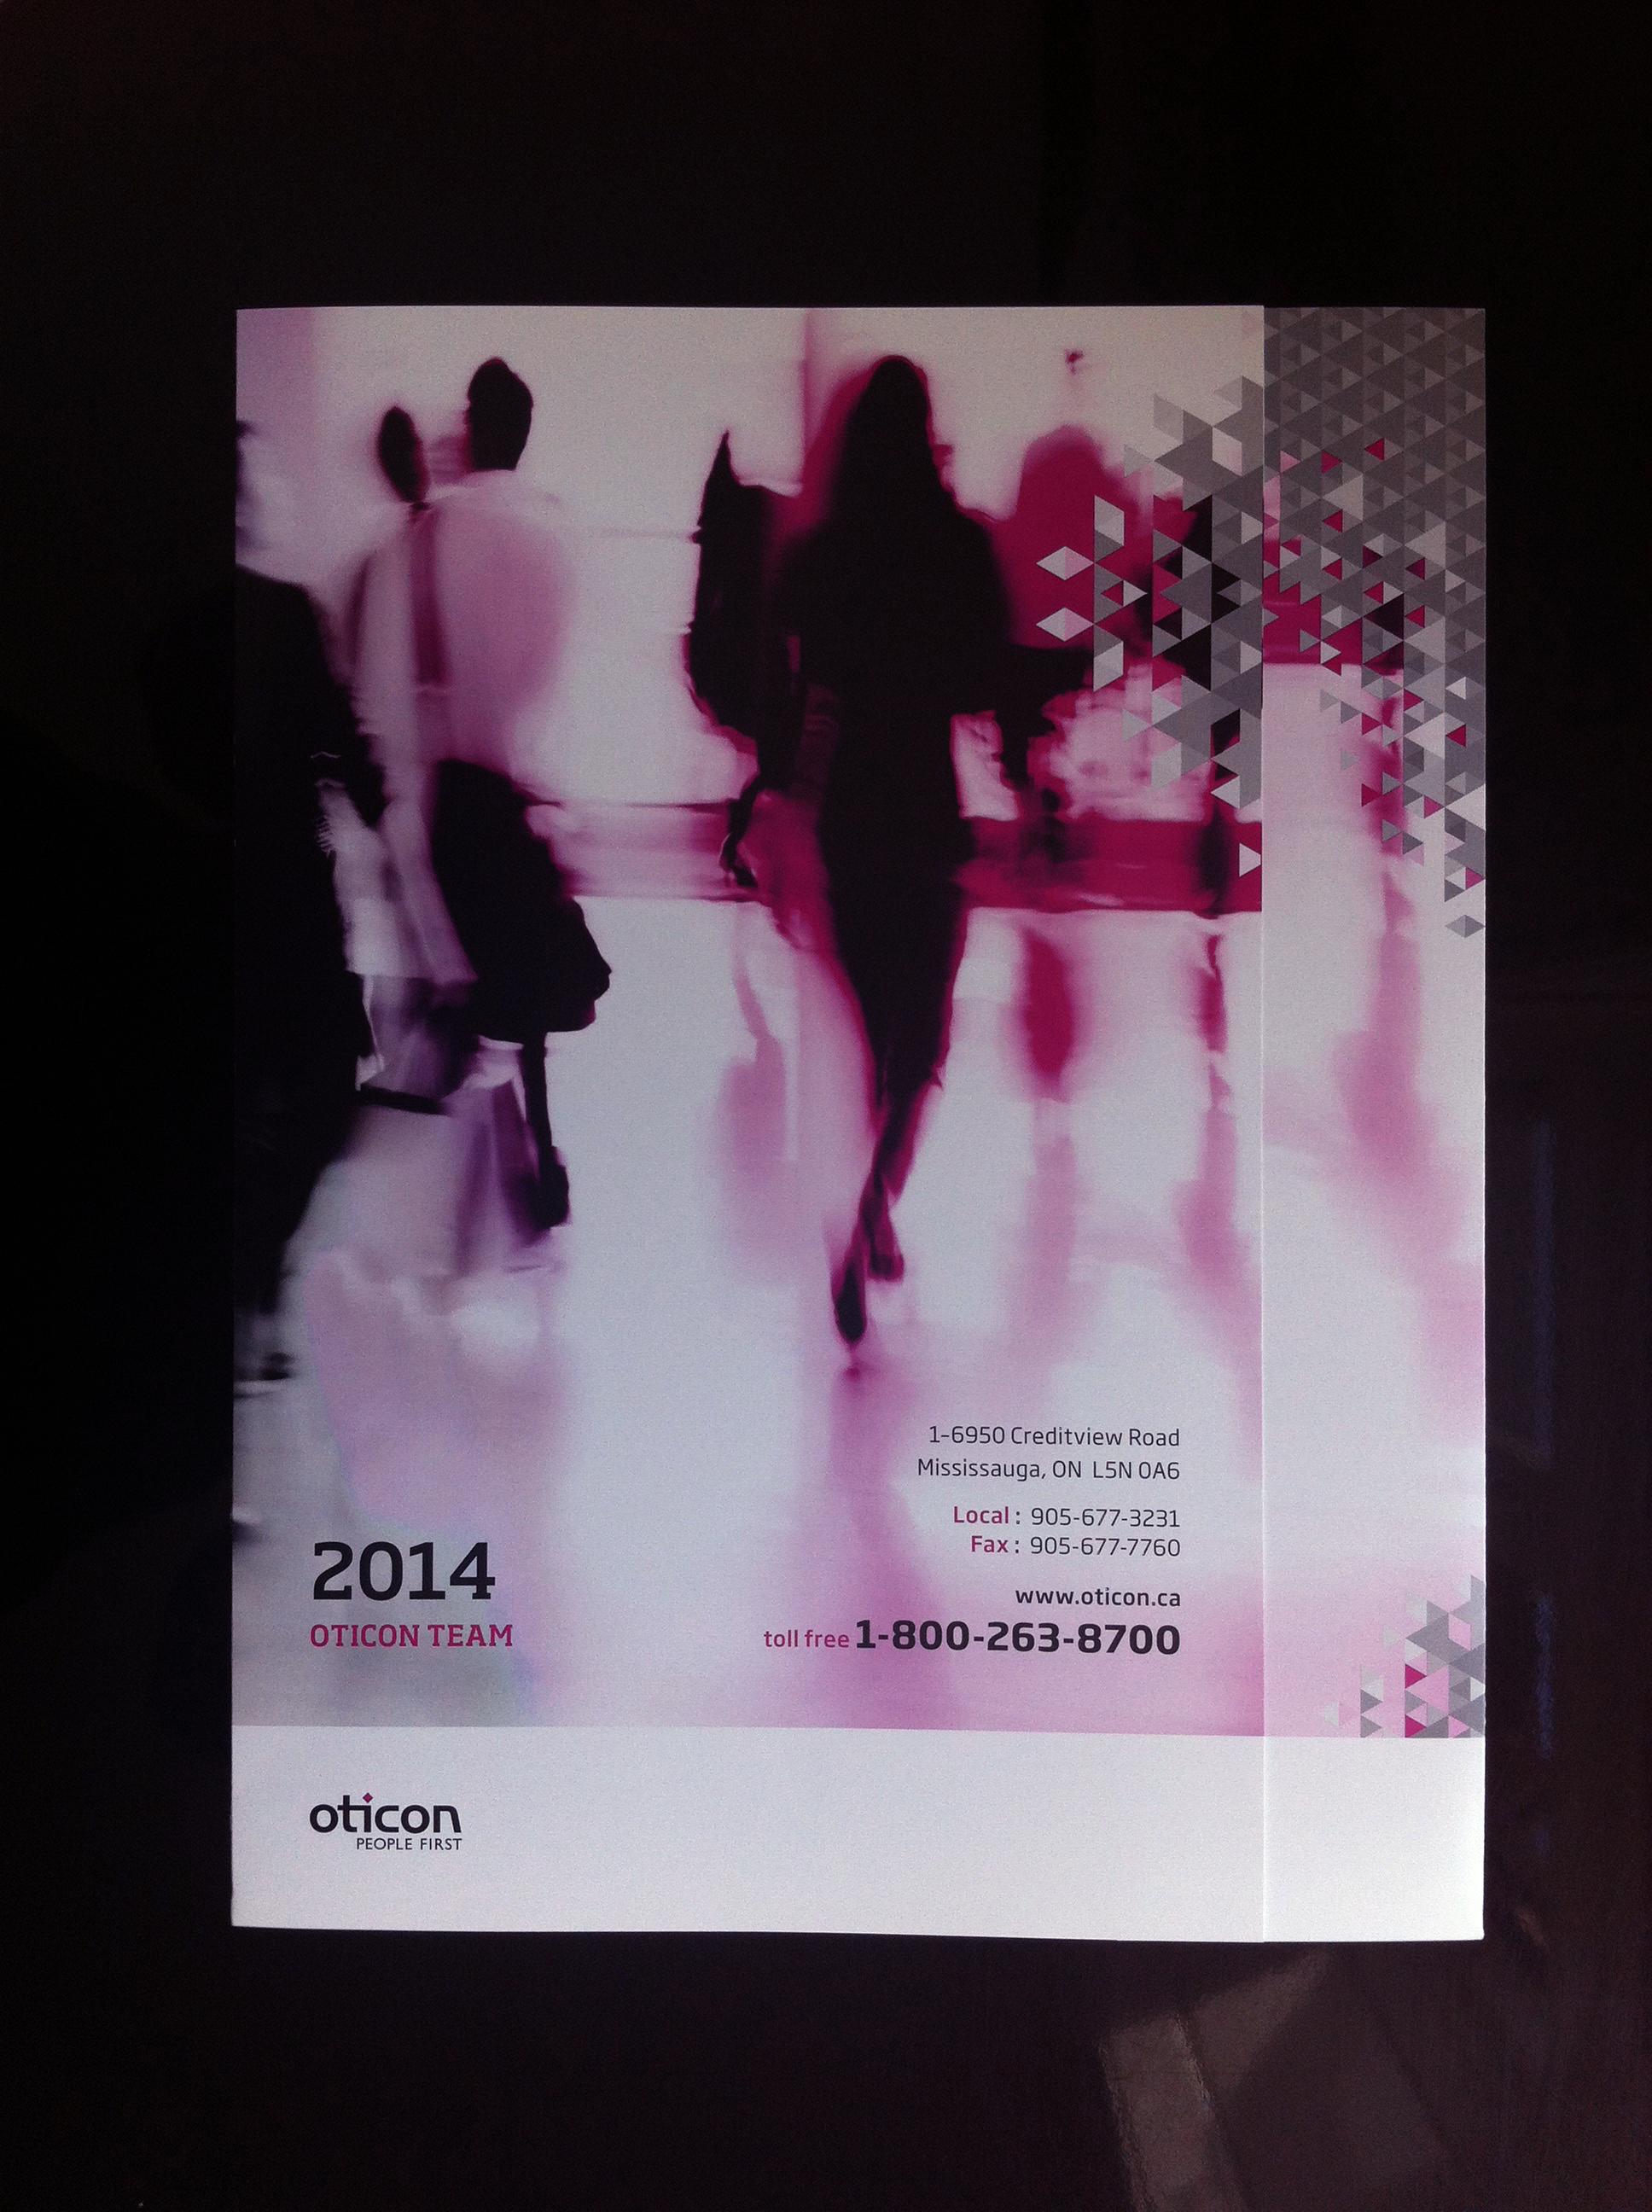 oticon-folder.png